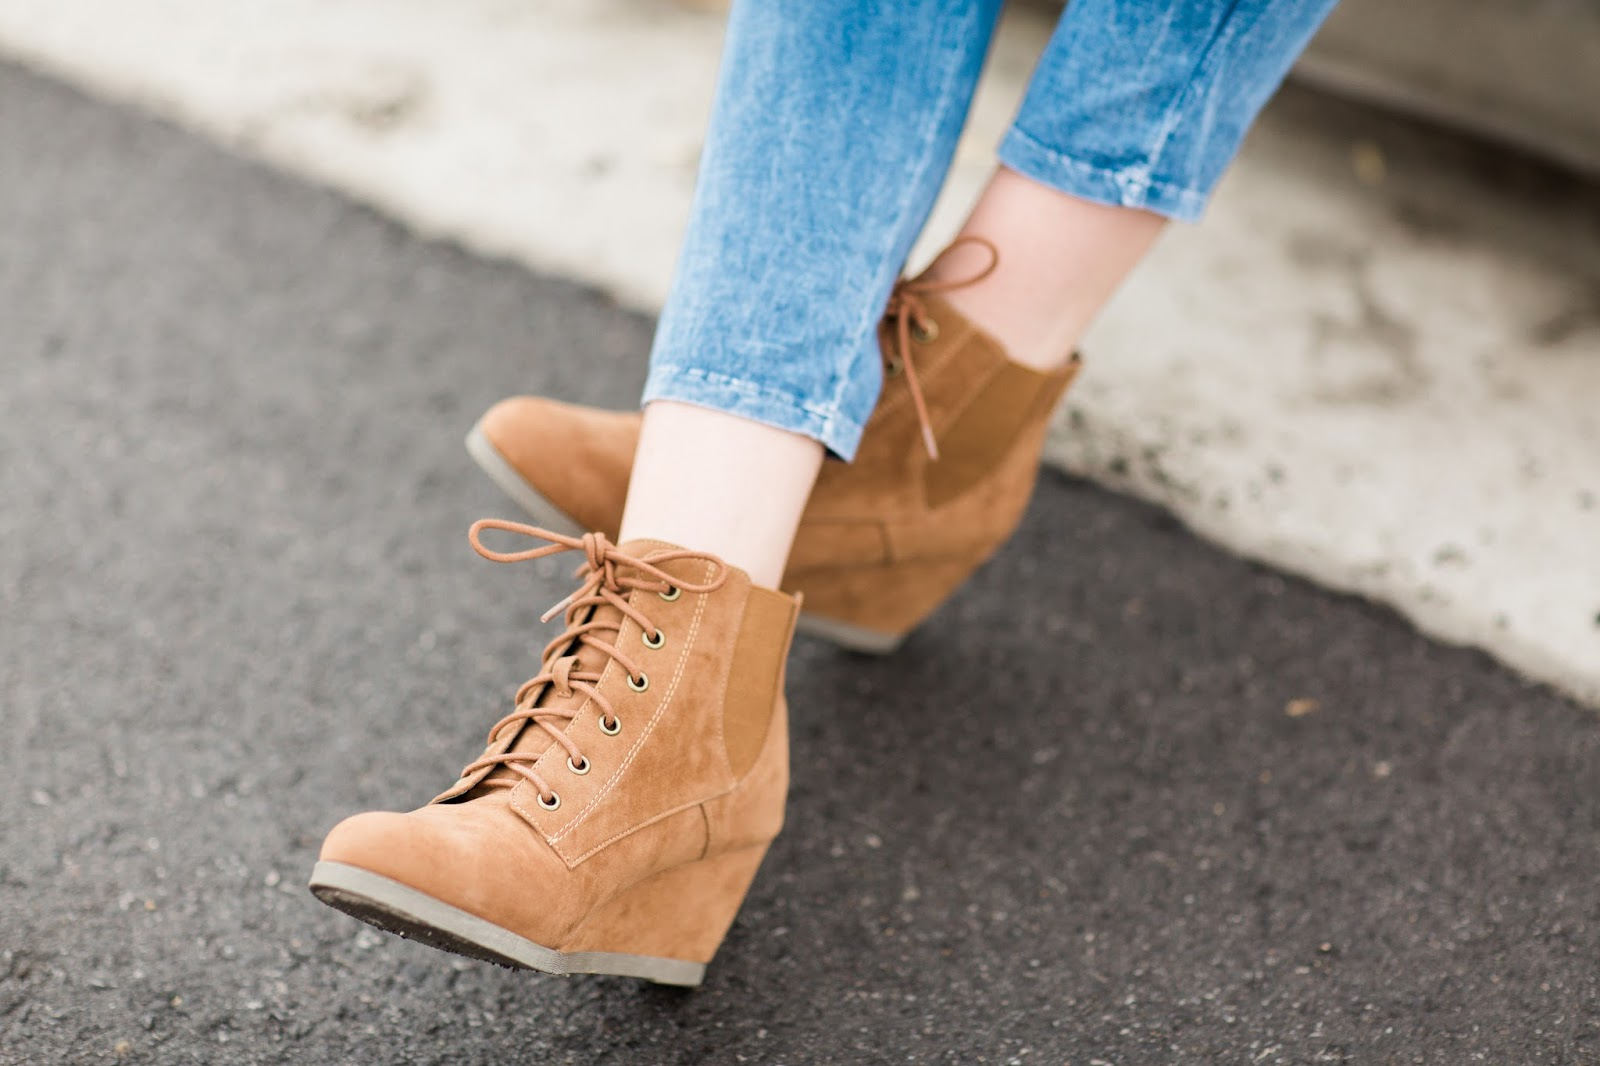 Lace Up Wedges, Ross, Utah Fashion Blogger